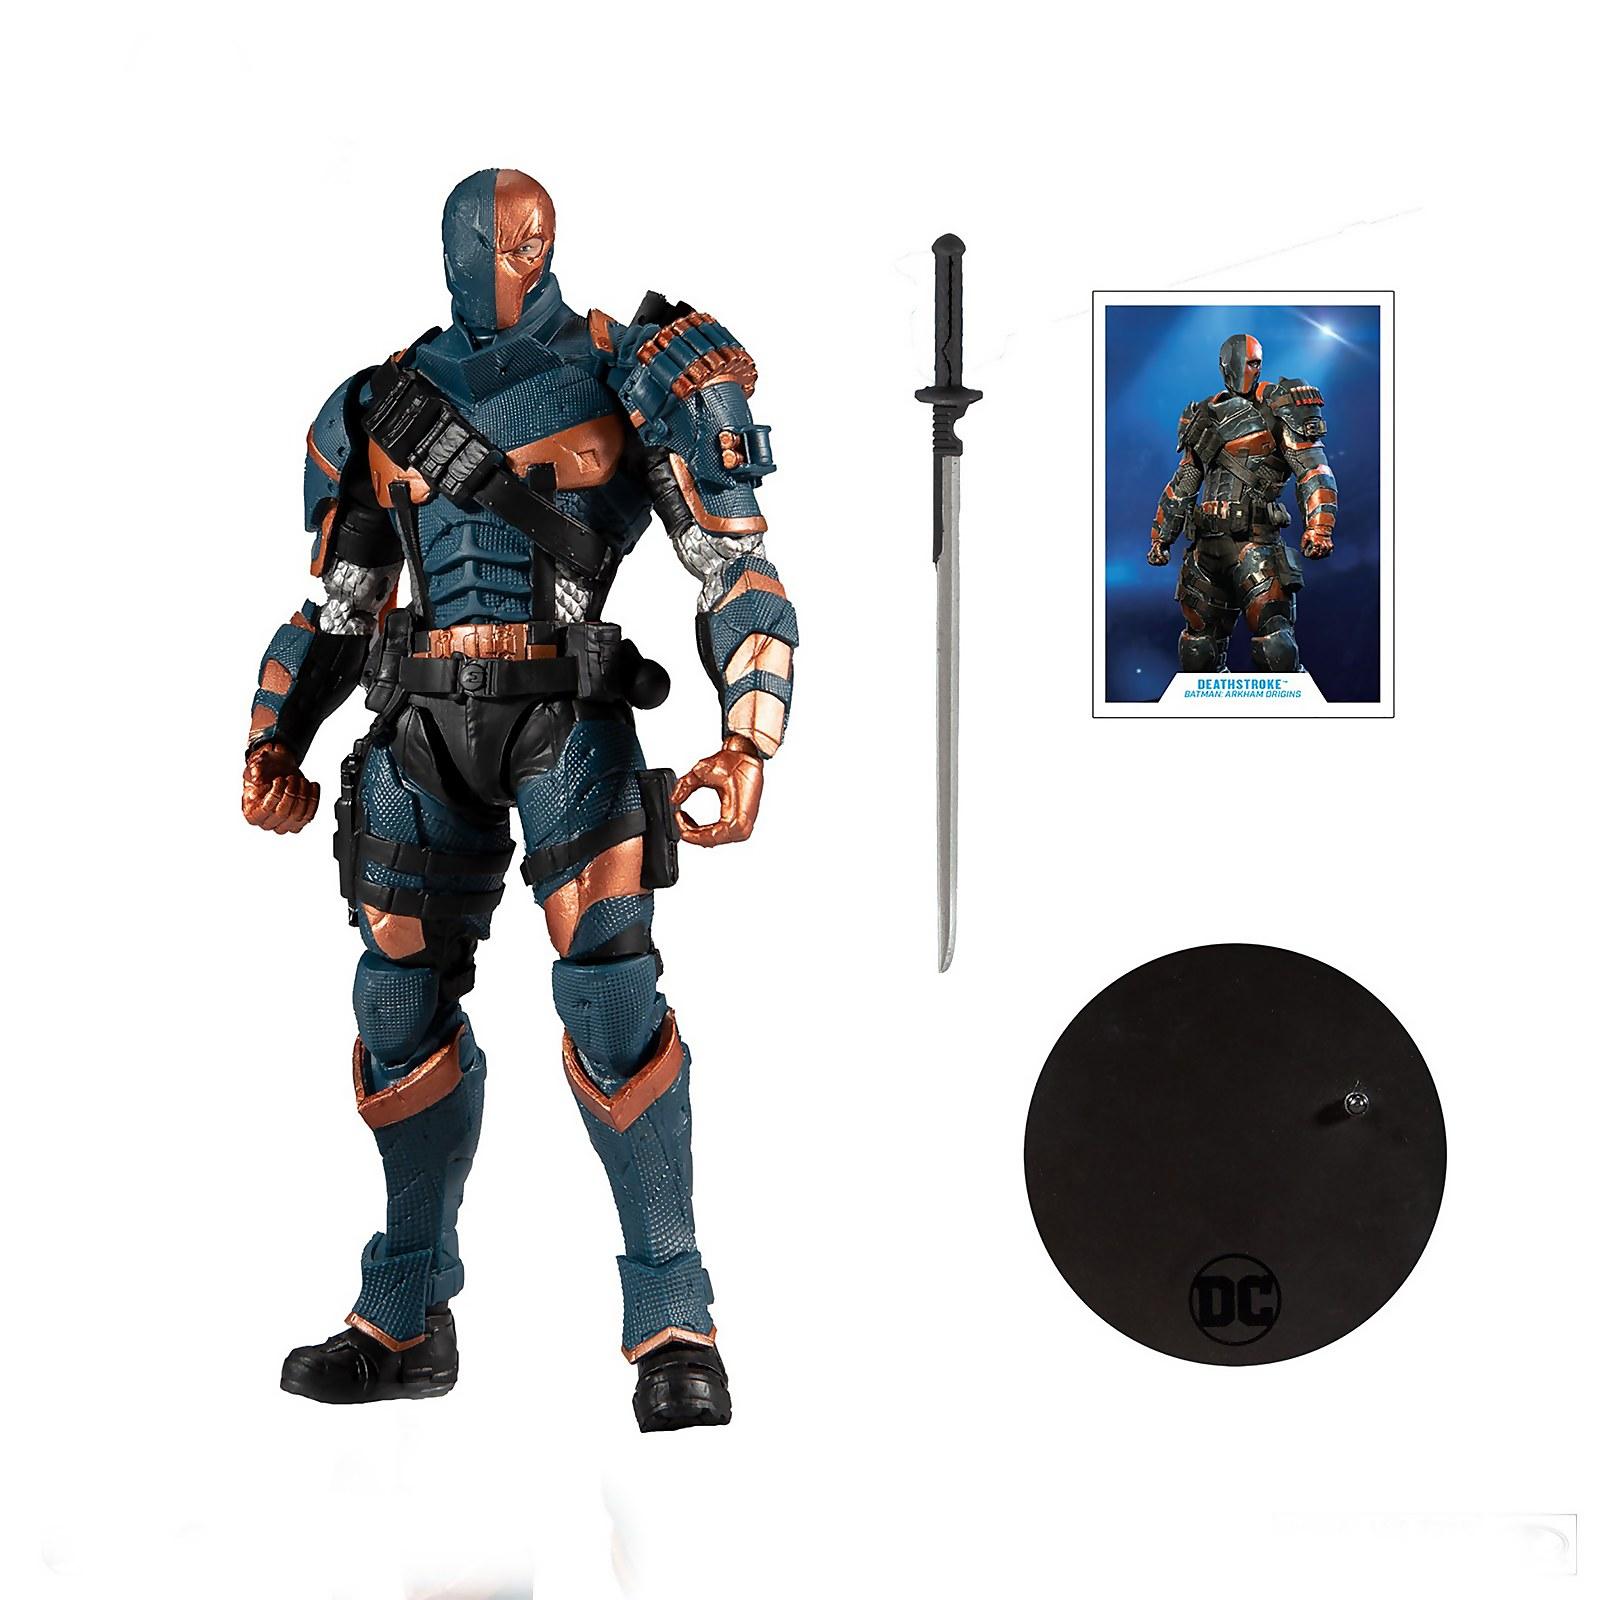 McFarlane DC Gaming 7 Action Figures - Wv2 - Arkham Origins Deathstroke Action Figure